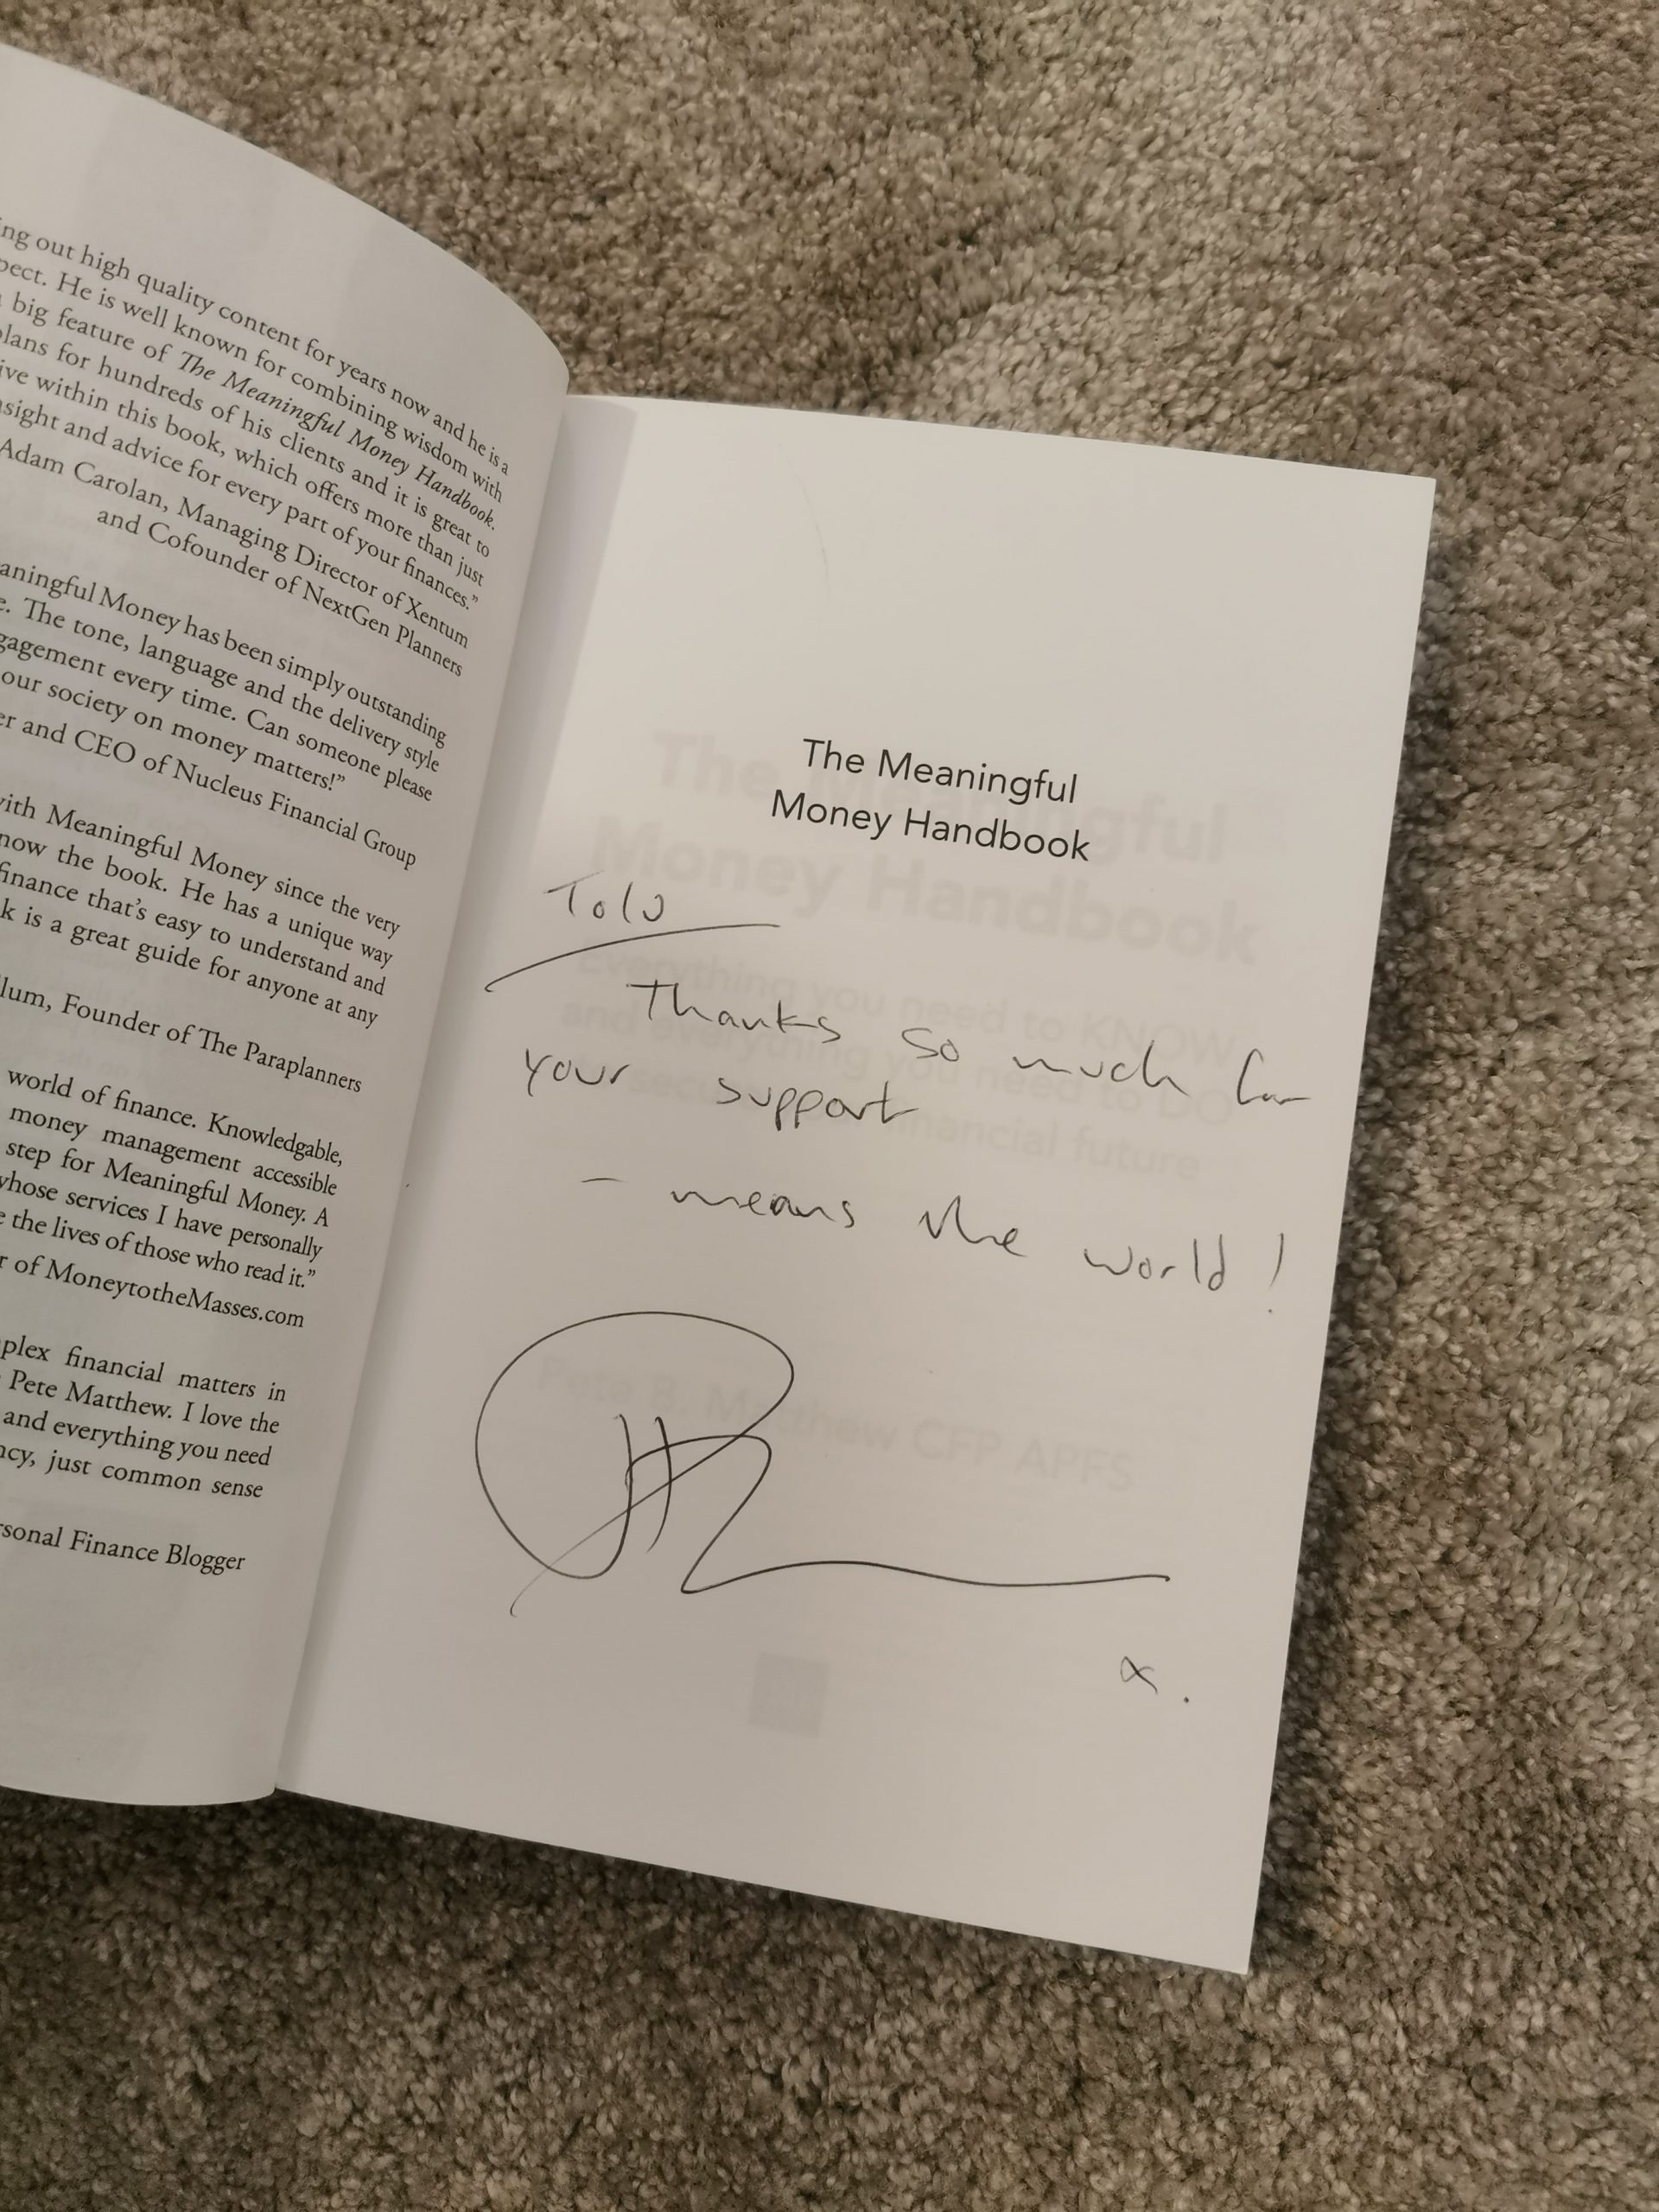 Tolu Book Review - The Meaningful Money Handbook